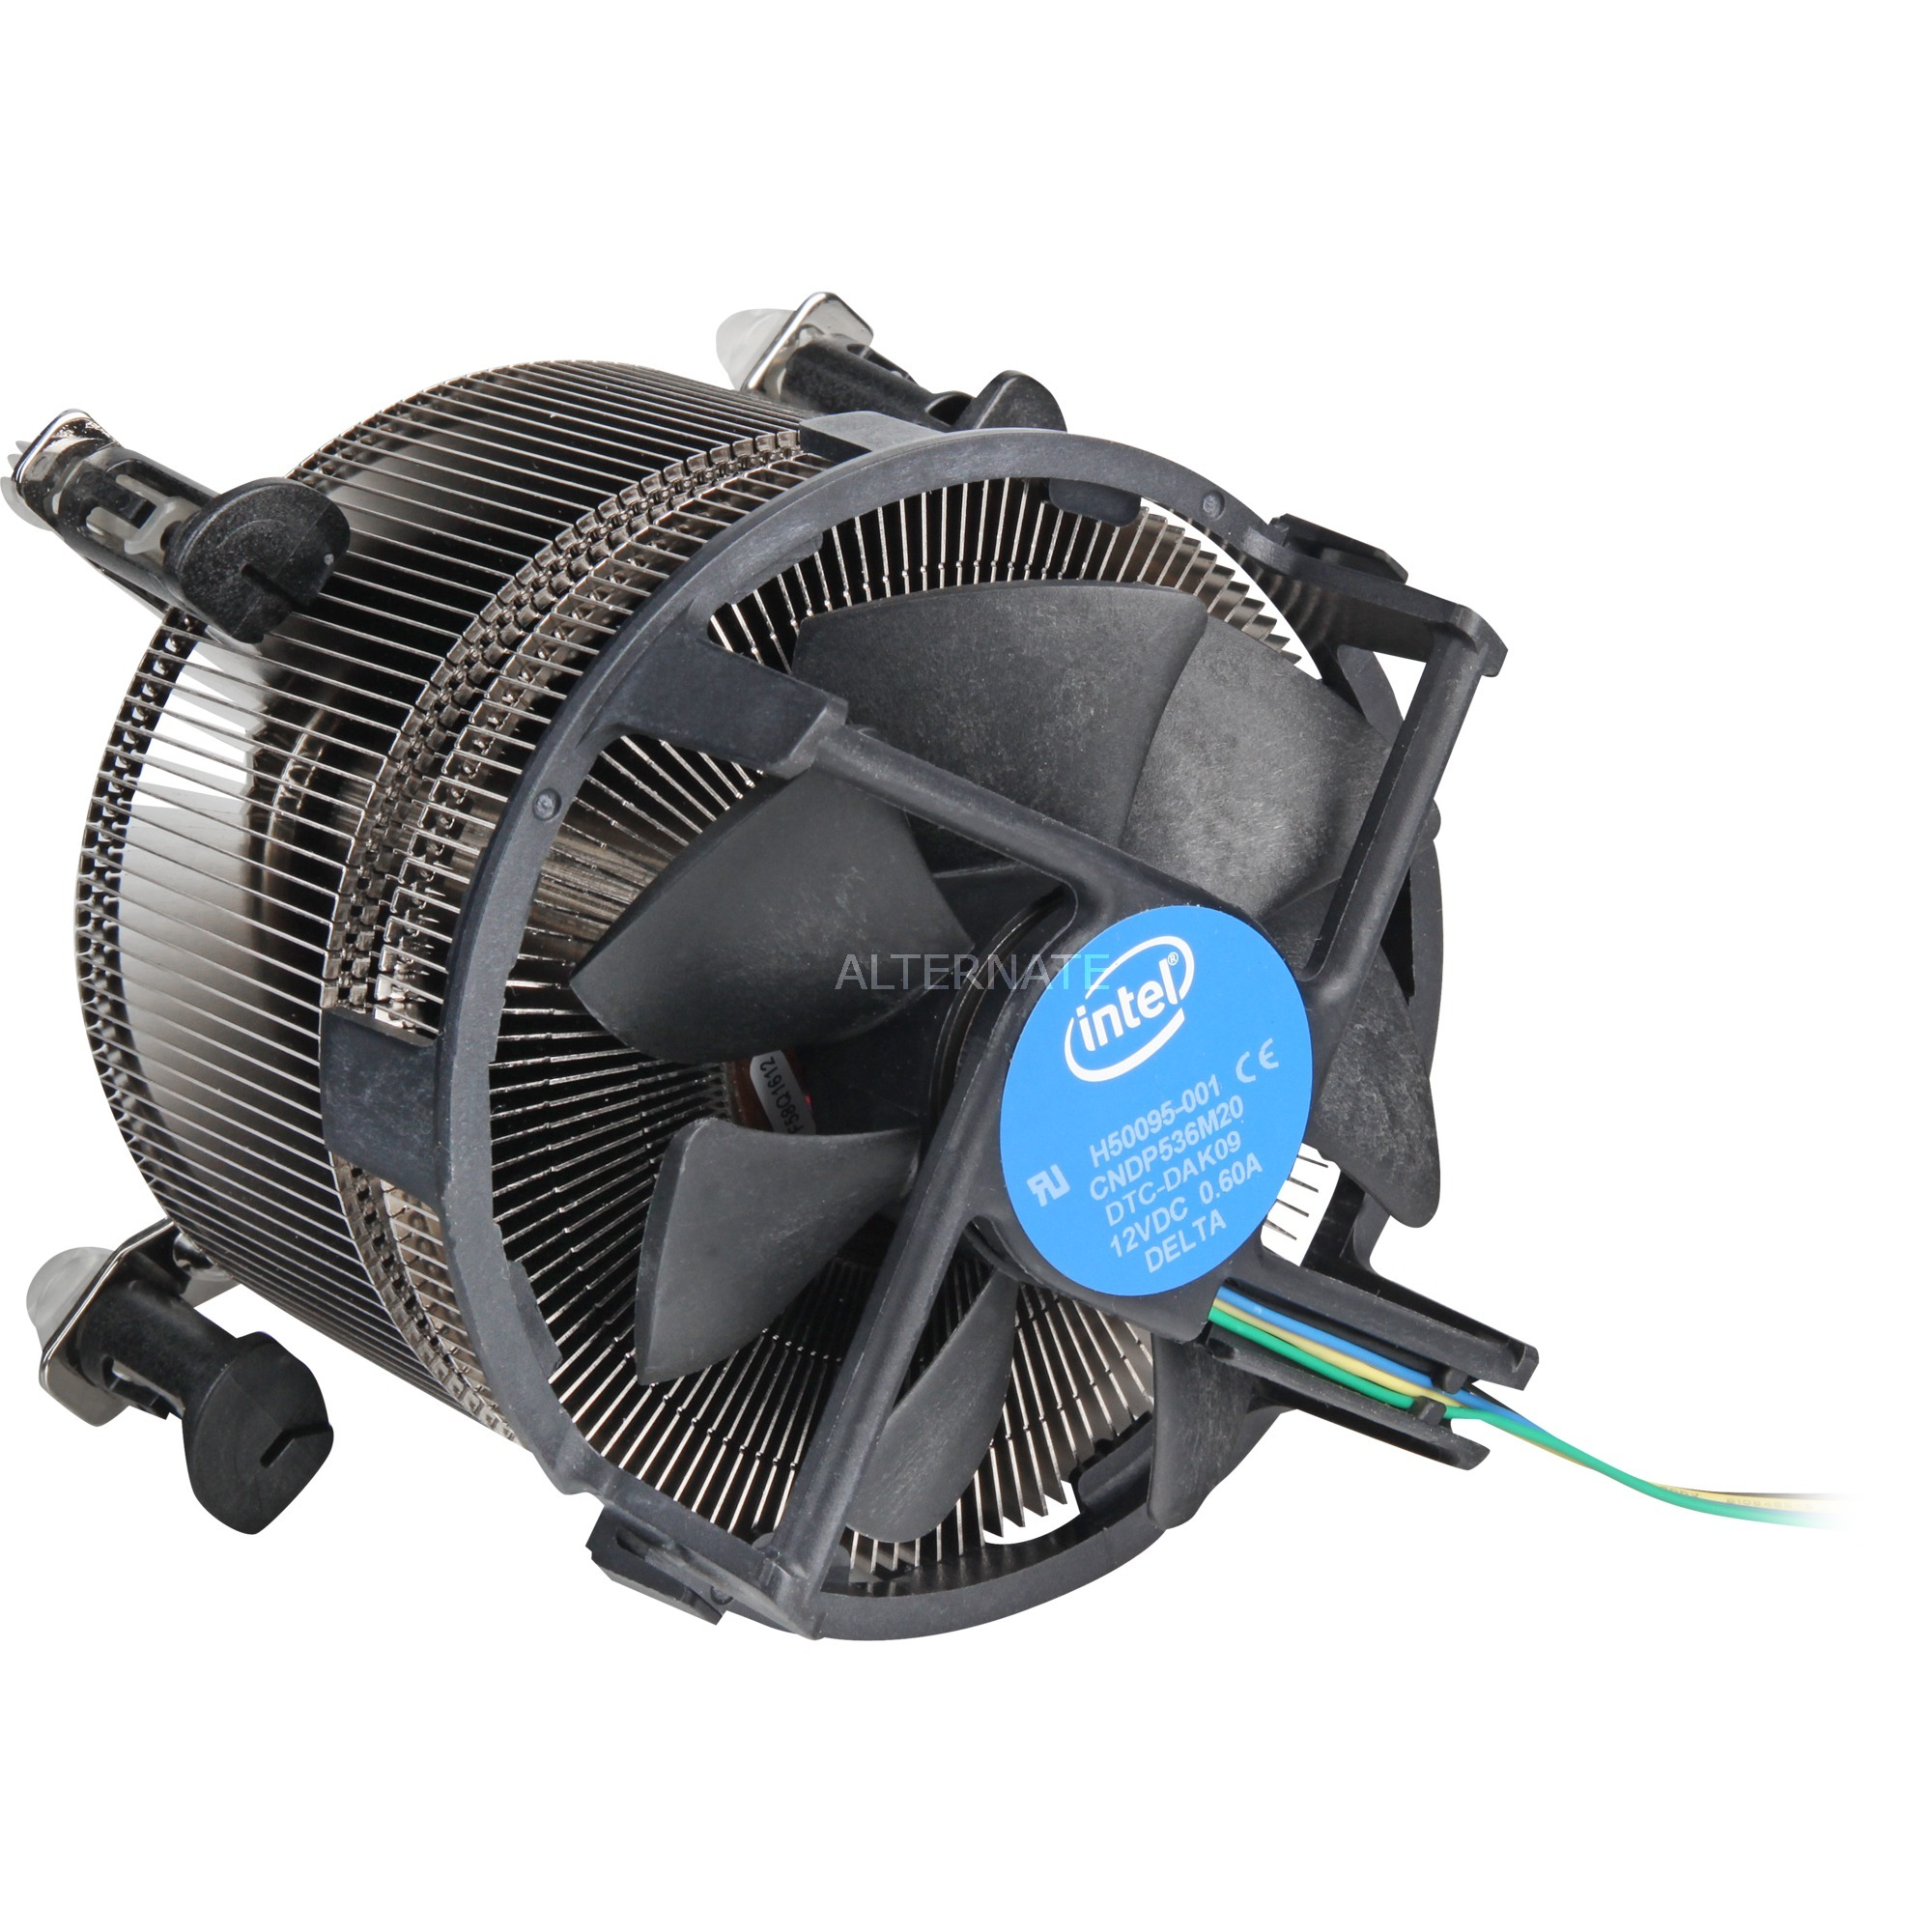 BXTS15A ventilador de PC Procesador Enfriador, Disipador de CPU